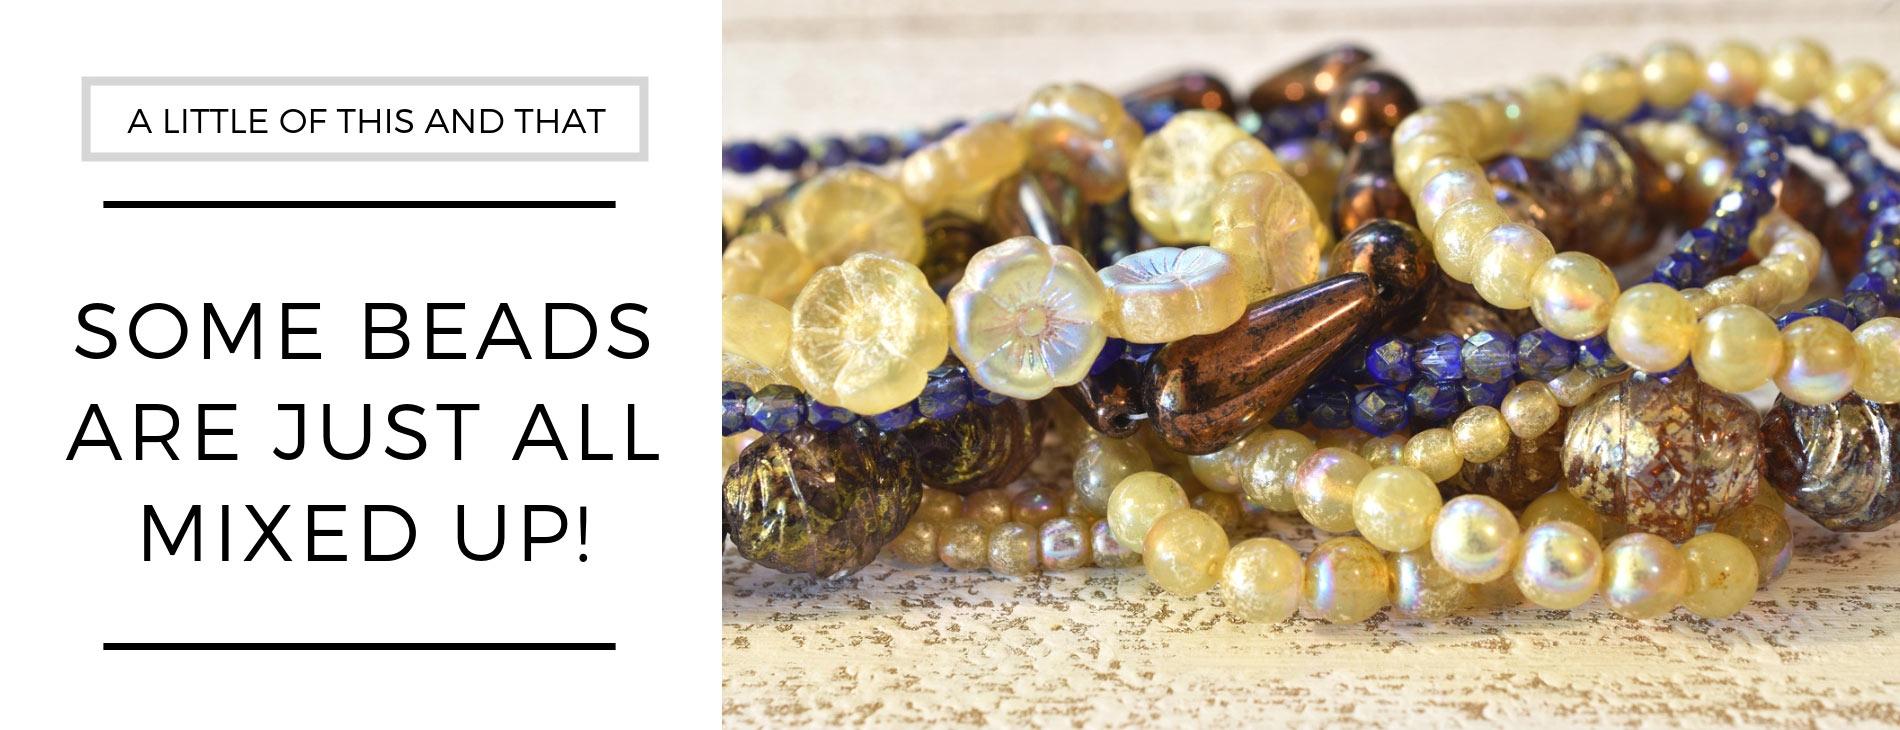 Miscellaneous beads